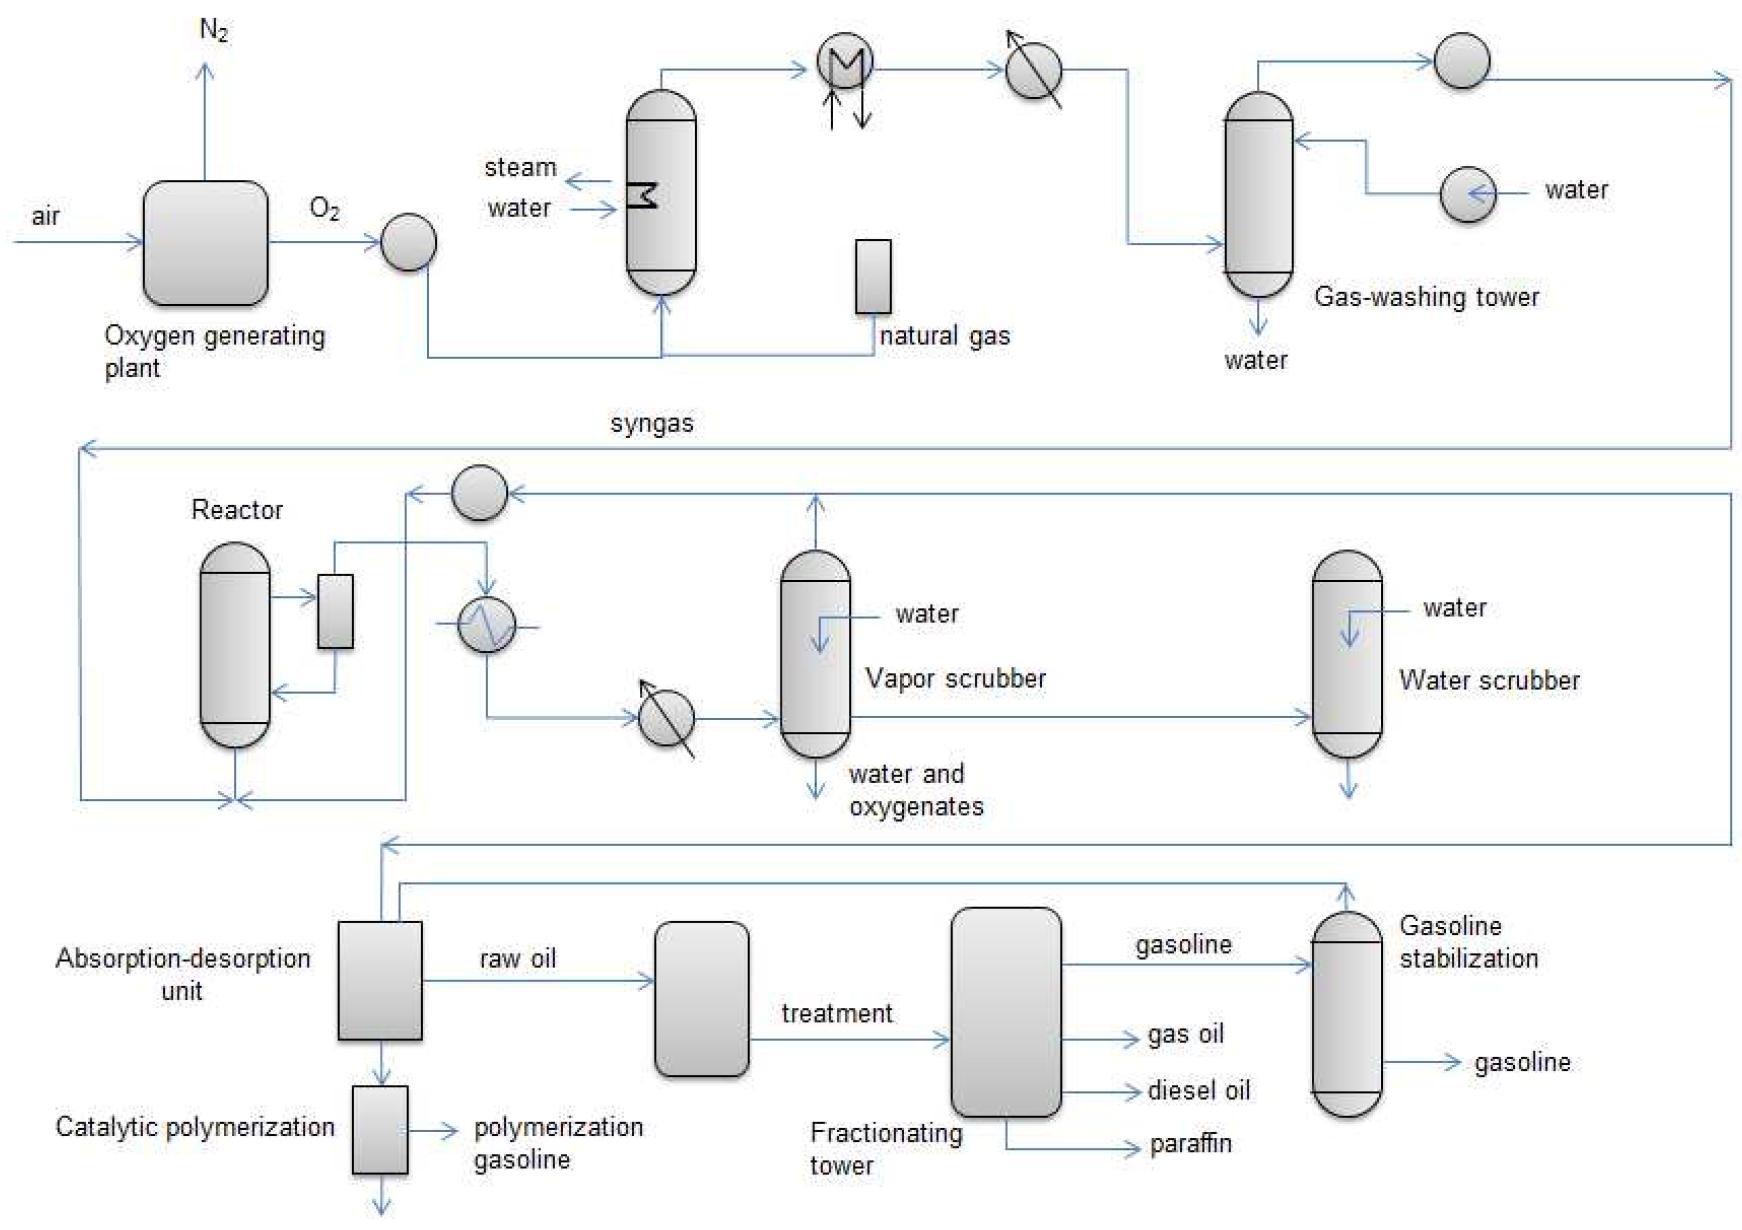 manufacturing process book by raghuvanshi pdf